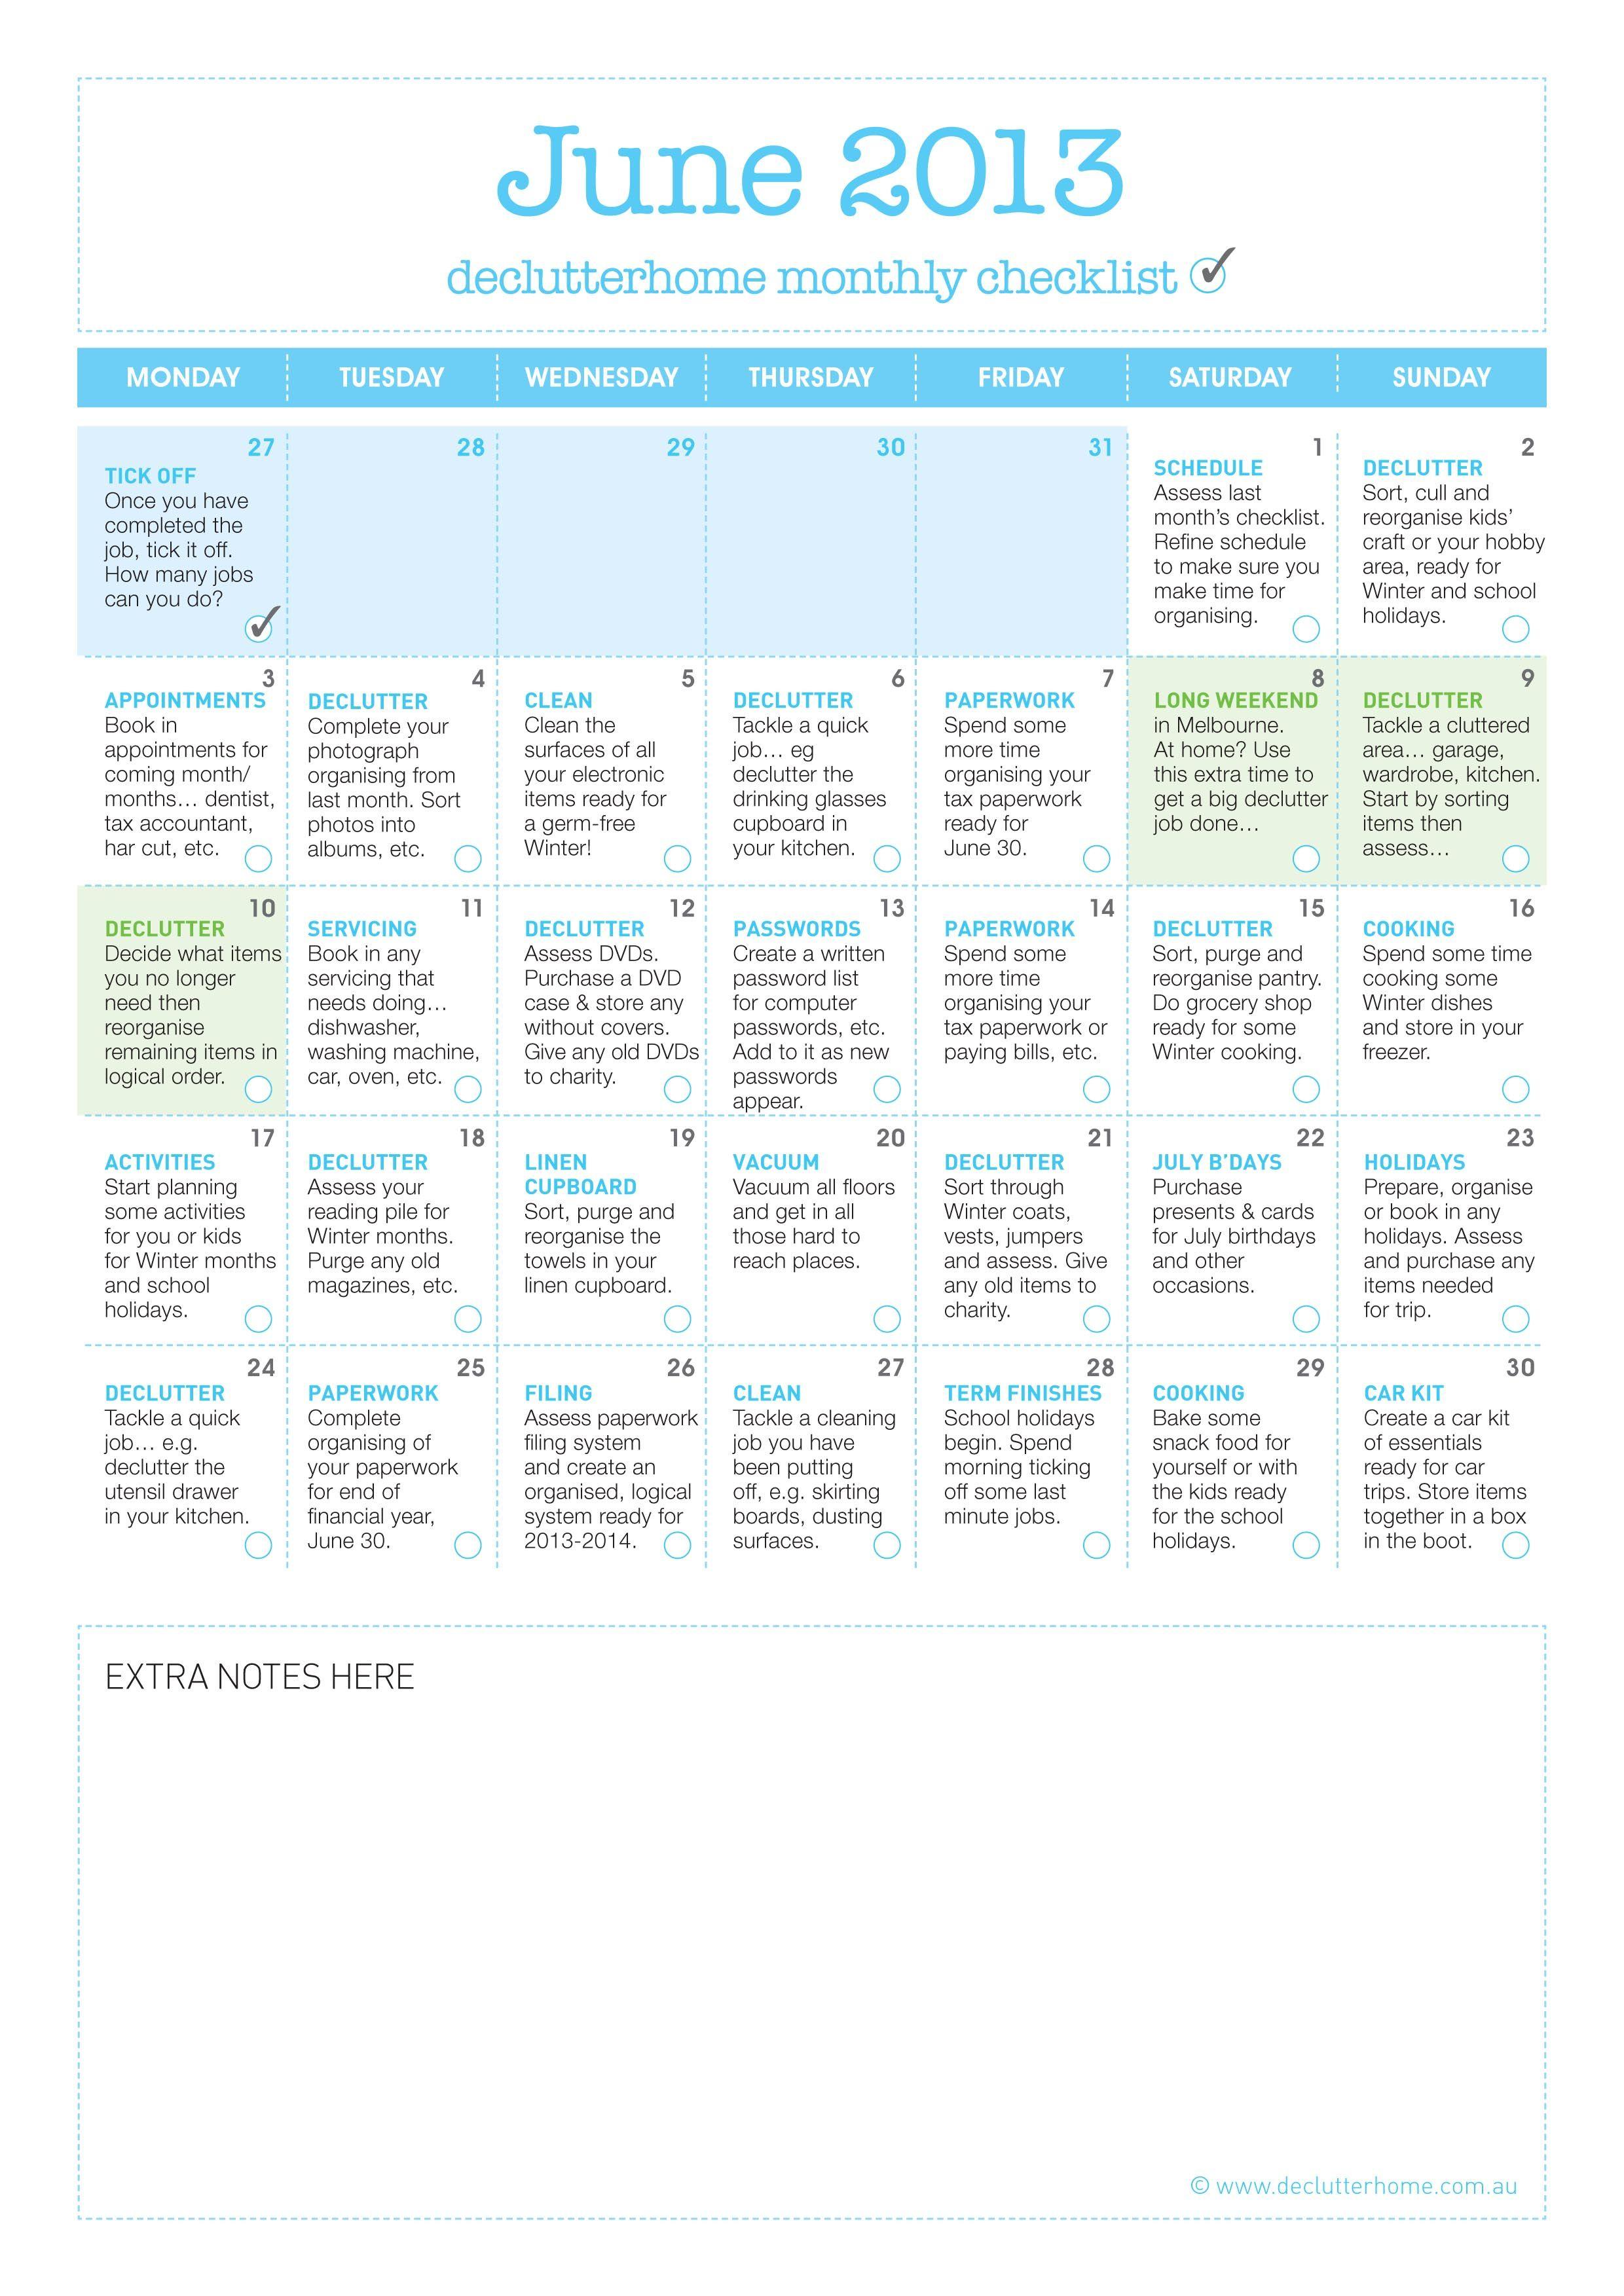 FREE Monthly Organising Checklist - June 2013